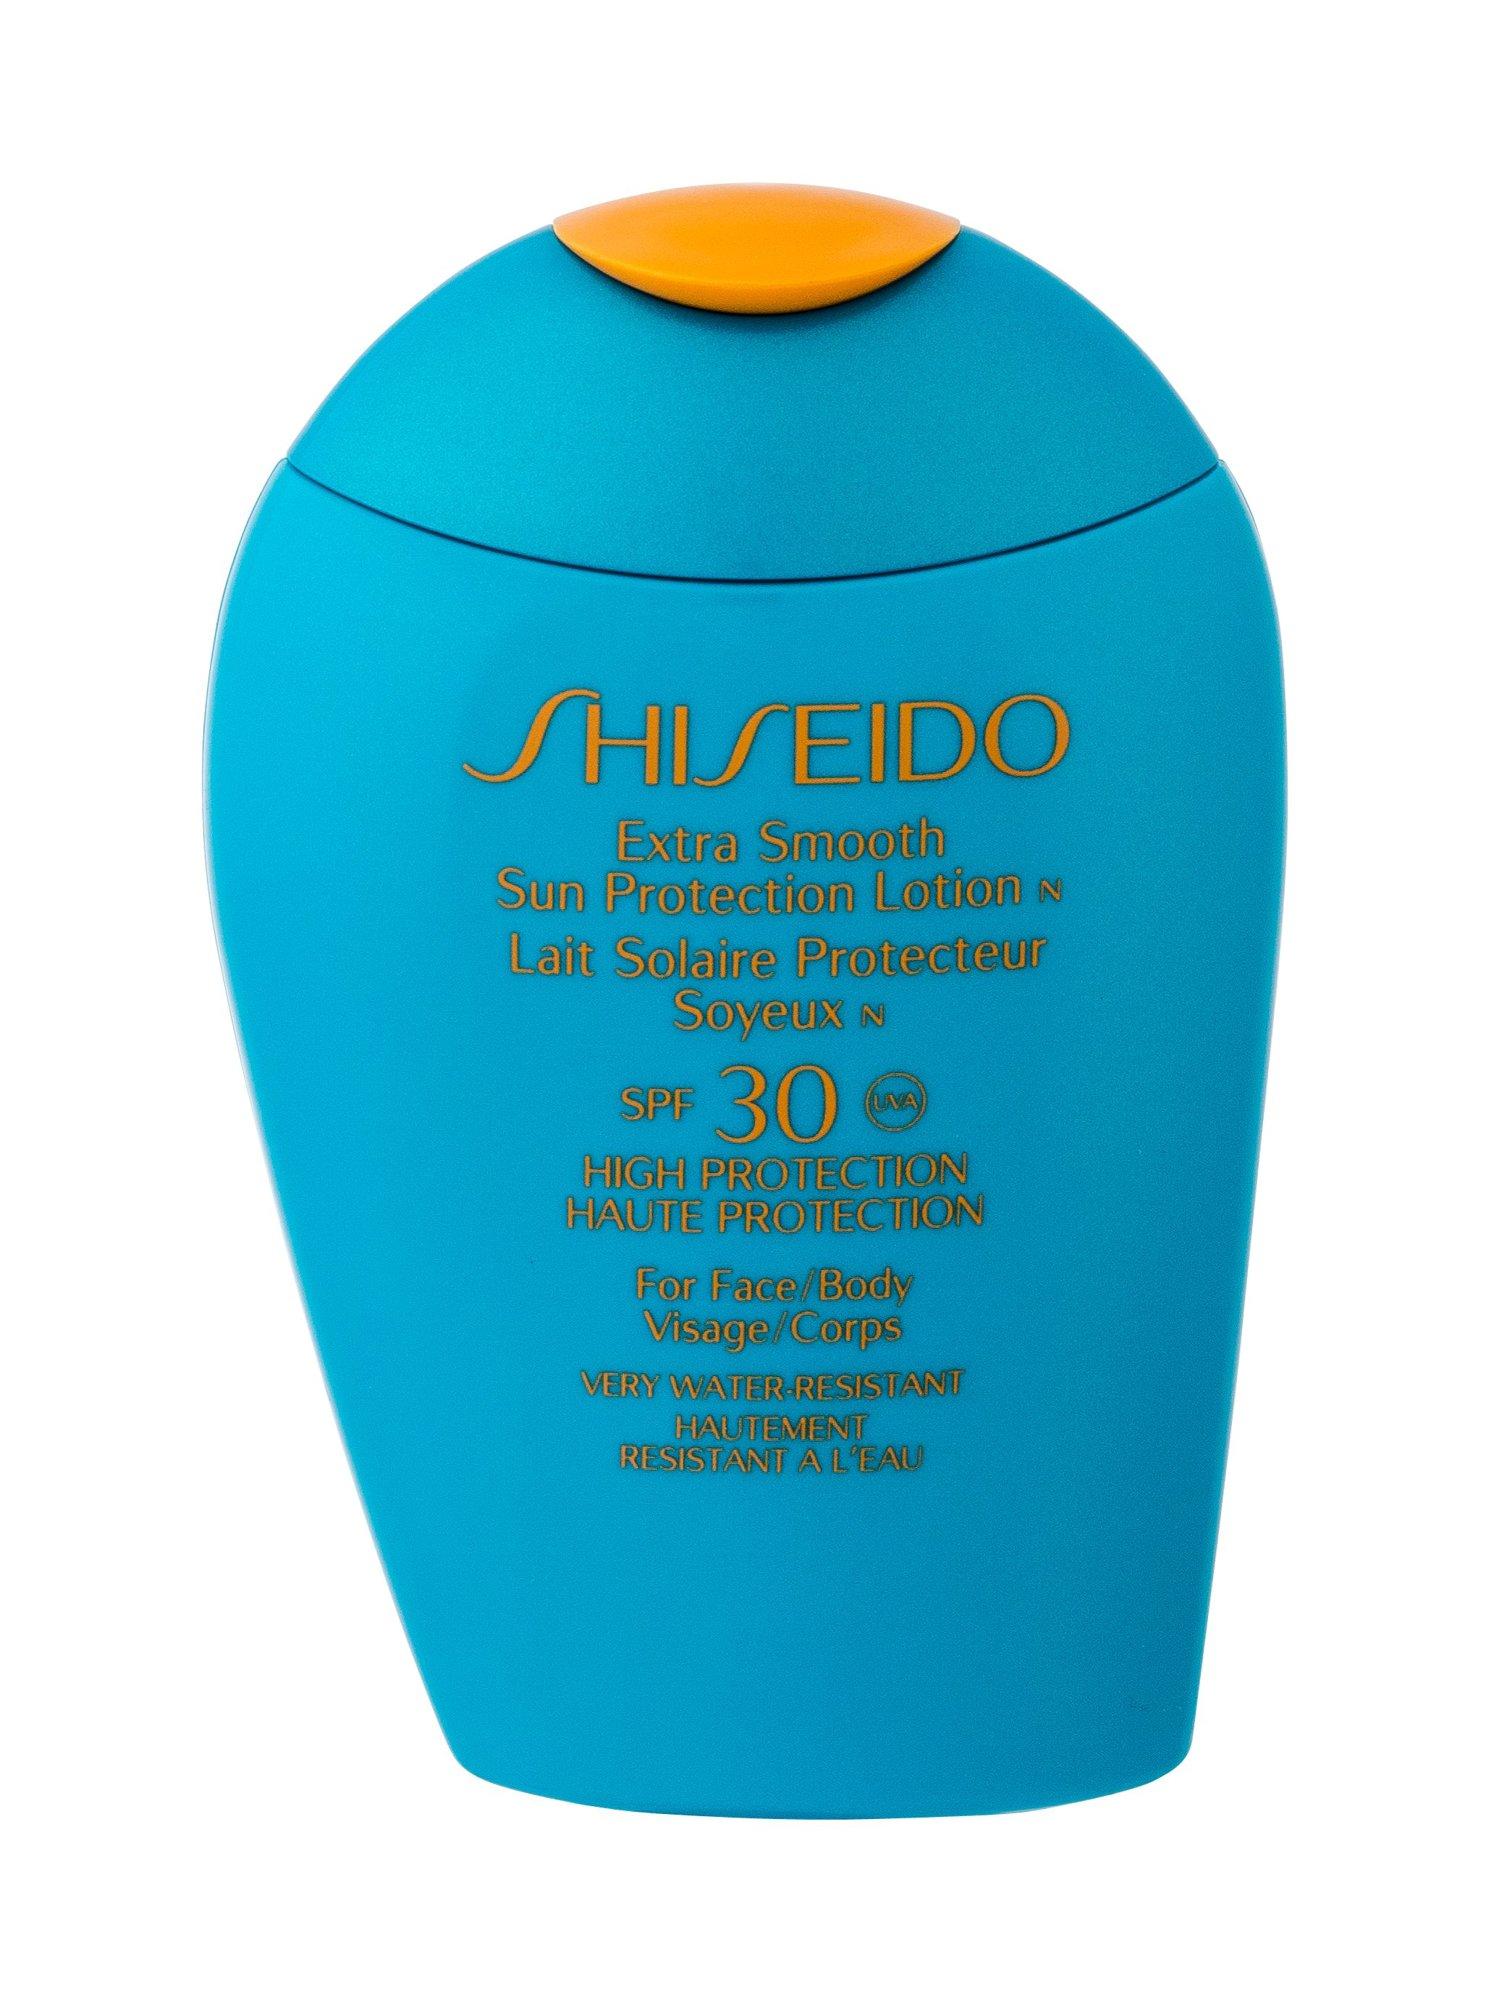 Shiseido Extra Smooth Sun Protection Cosmetic 100ml